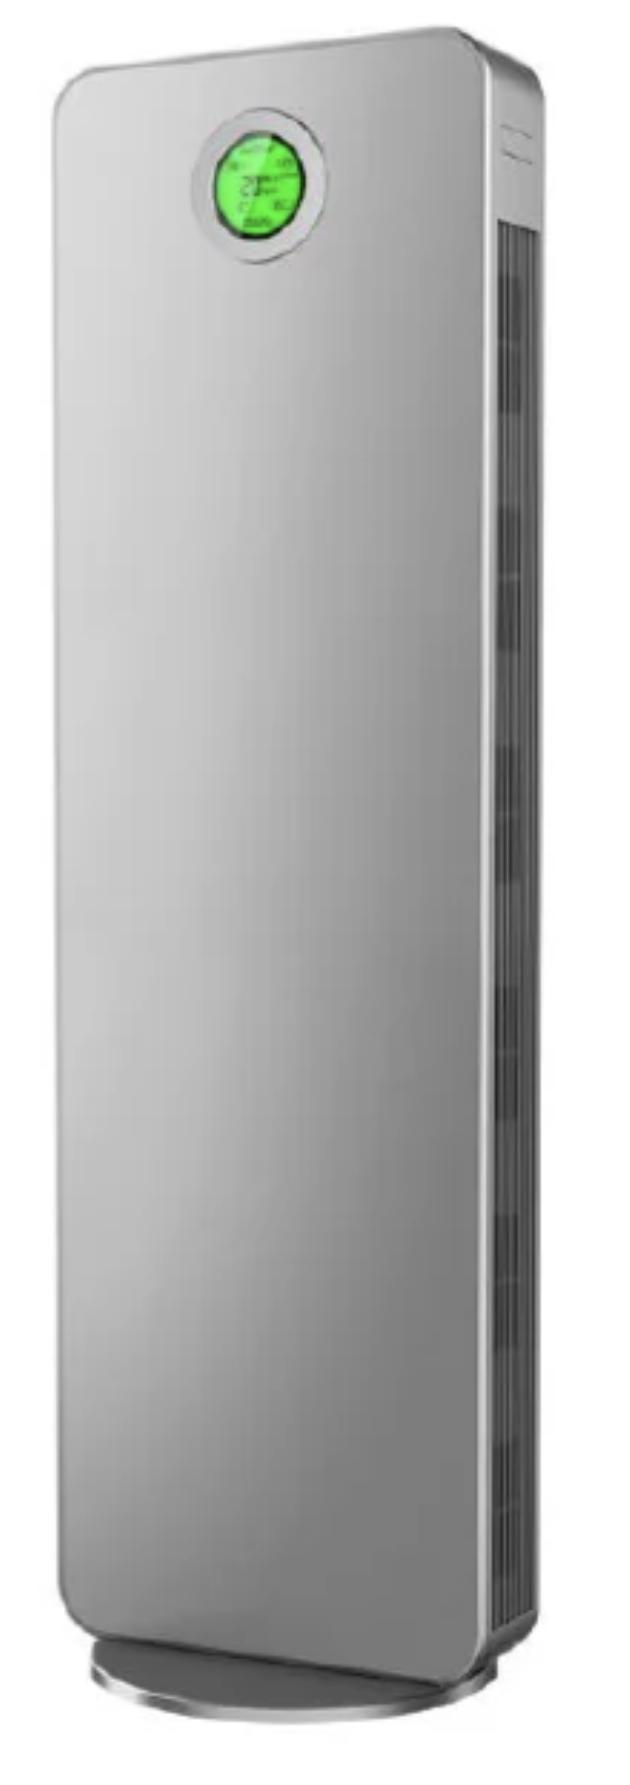 Nevoox LF 2050 UV-C-LUFTREINIGER